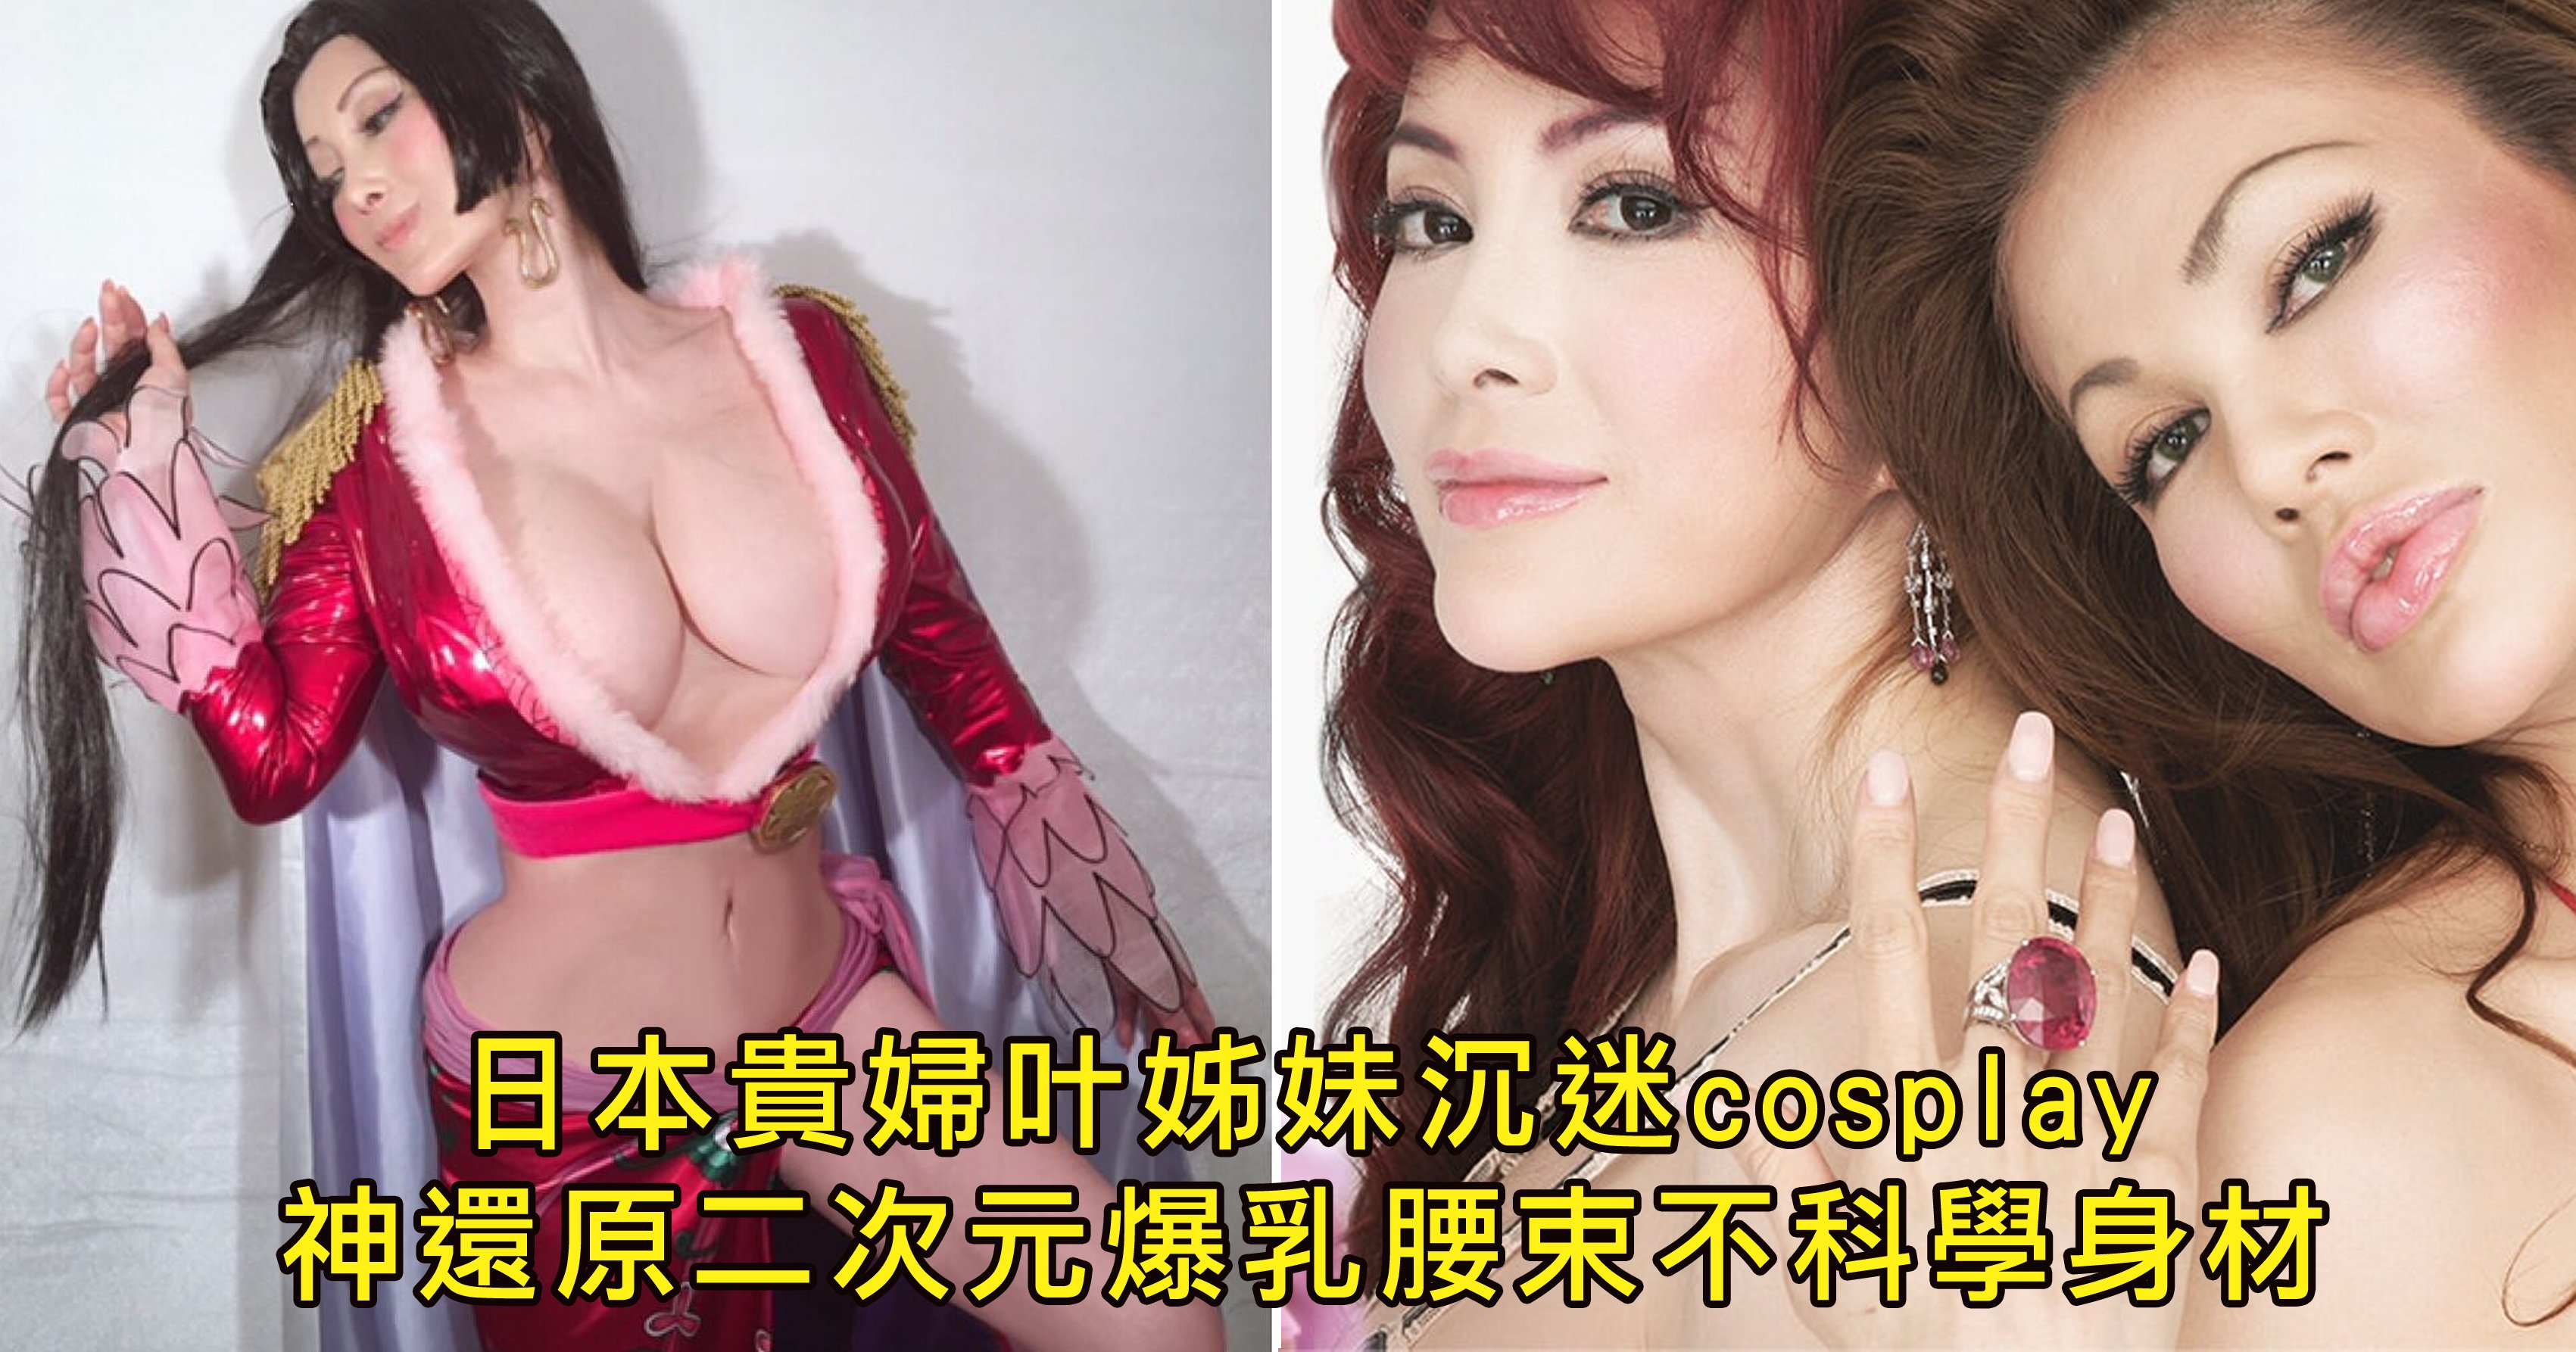 181029 216.jpg?resize=300,169 - 這才是真正的蛇姬!日本貴婦迷上cosplay,神還原二次元爆乳身材